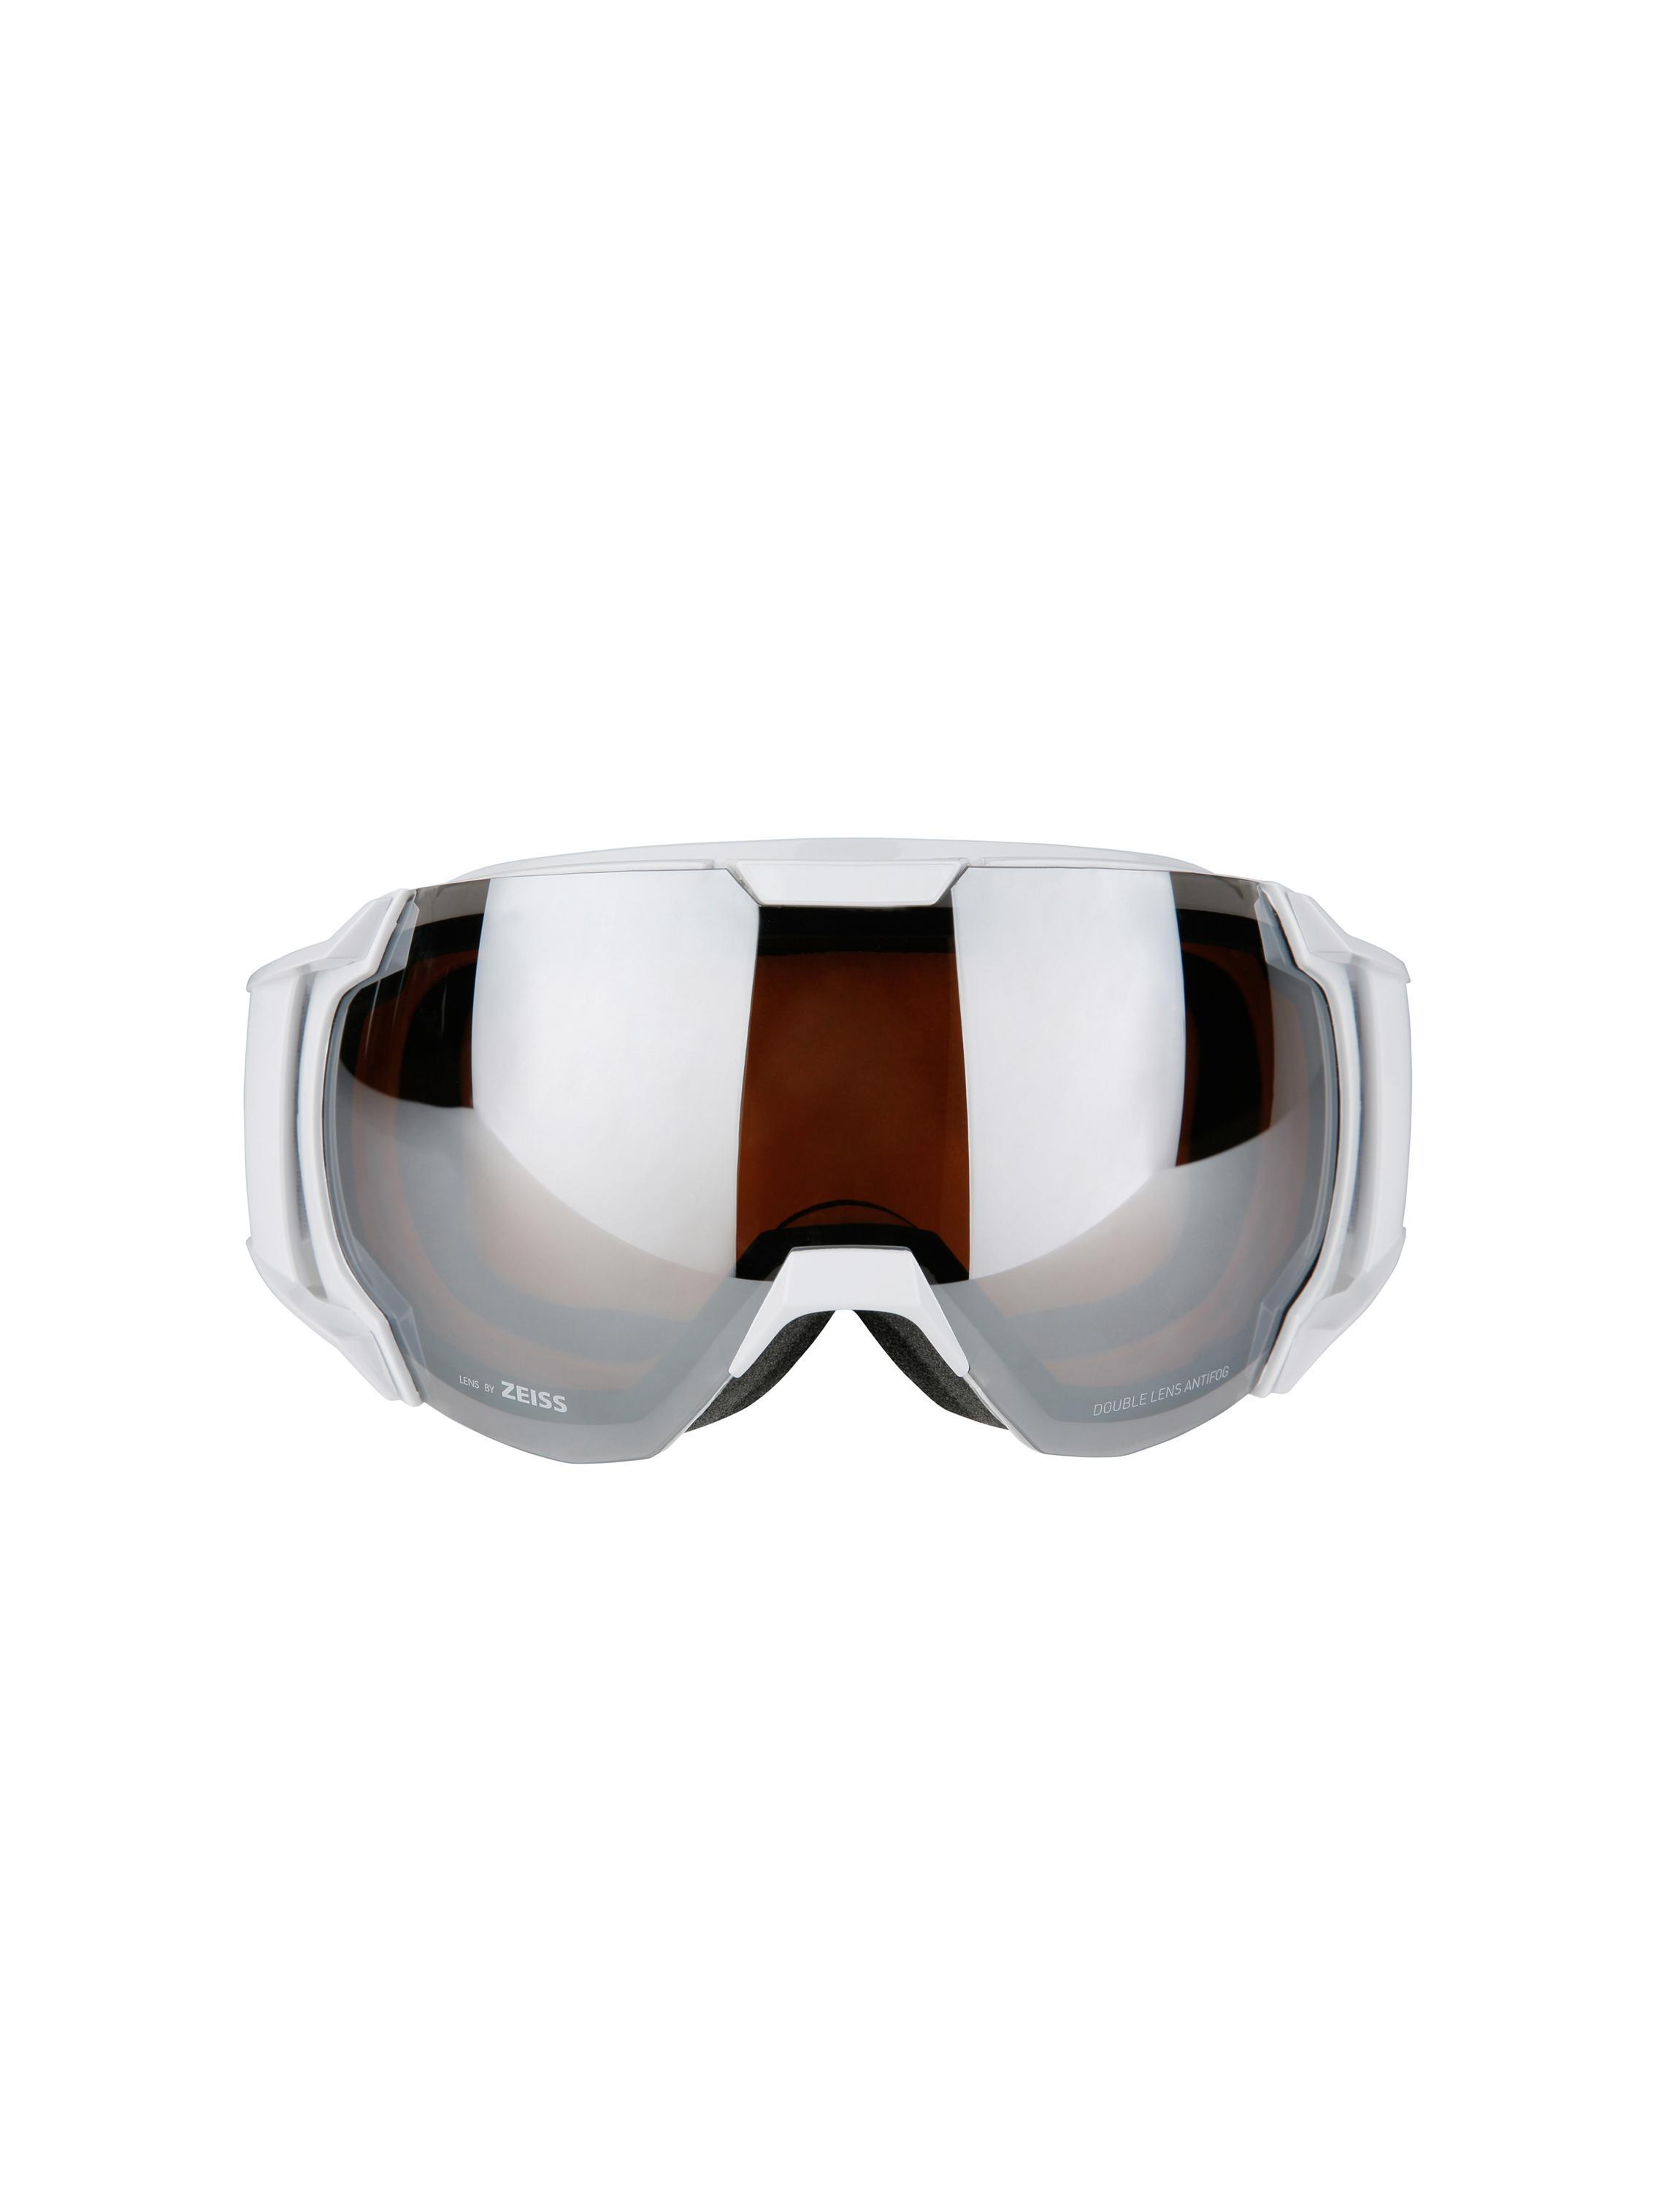 5b4fc4c993e Lyst - Bogner Ski Goggles Just B in White